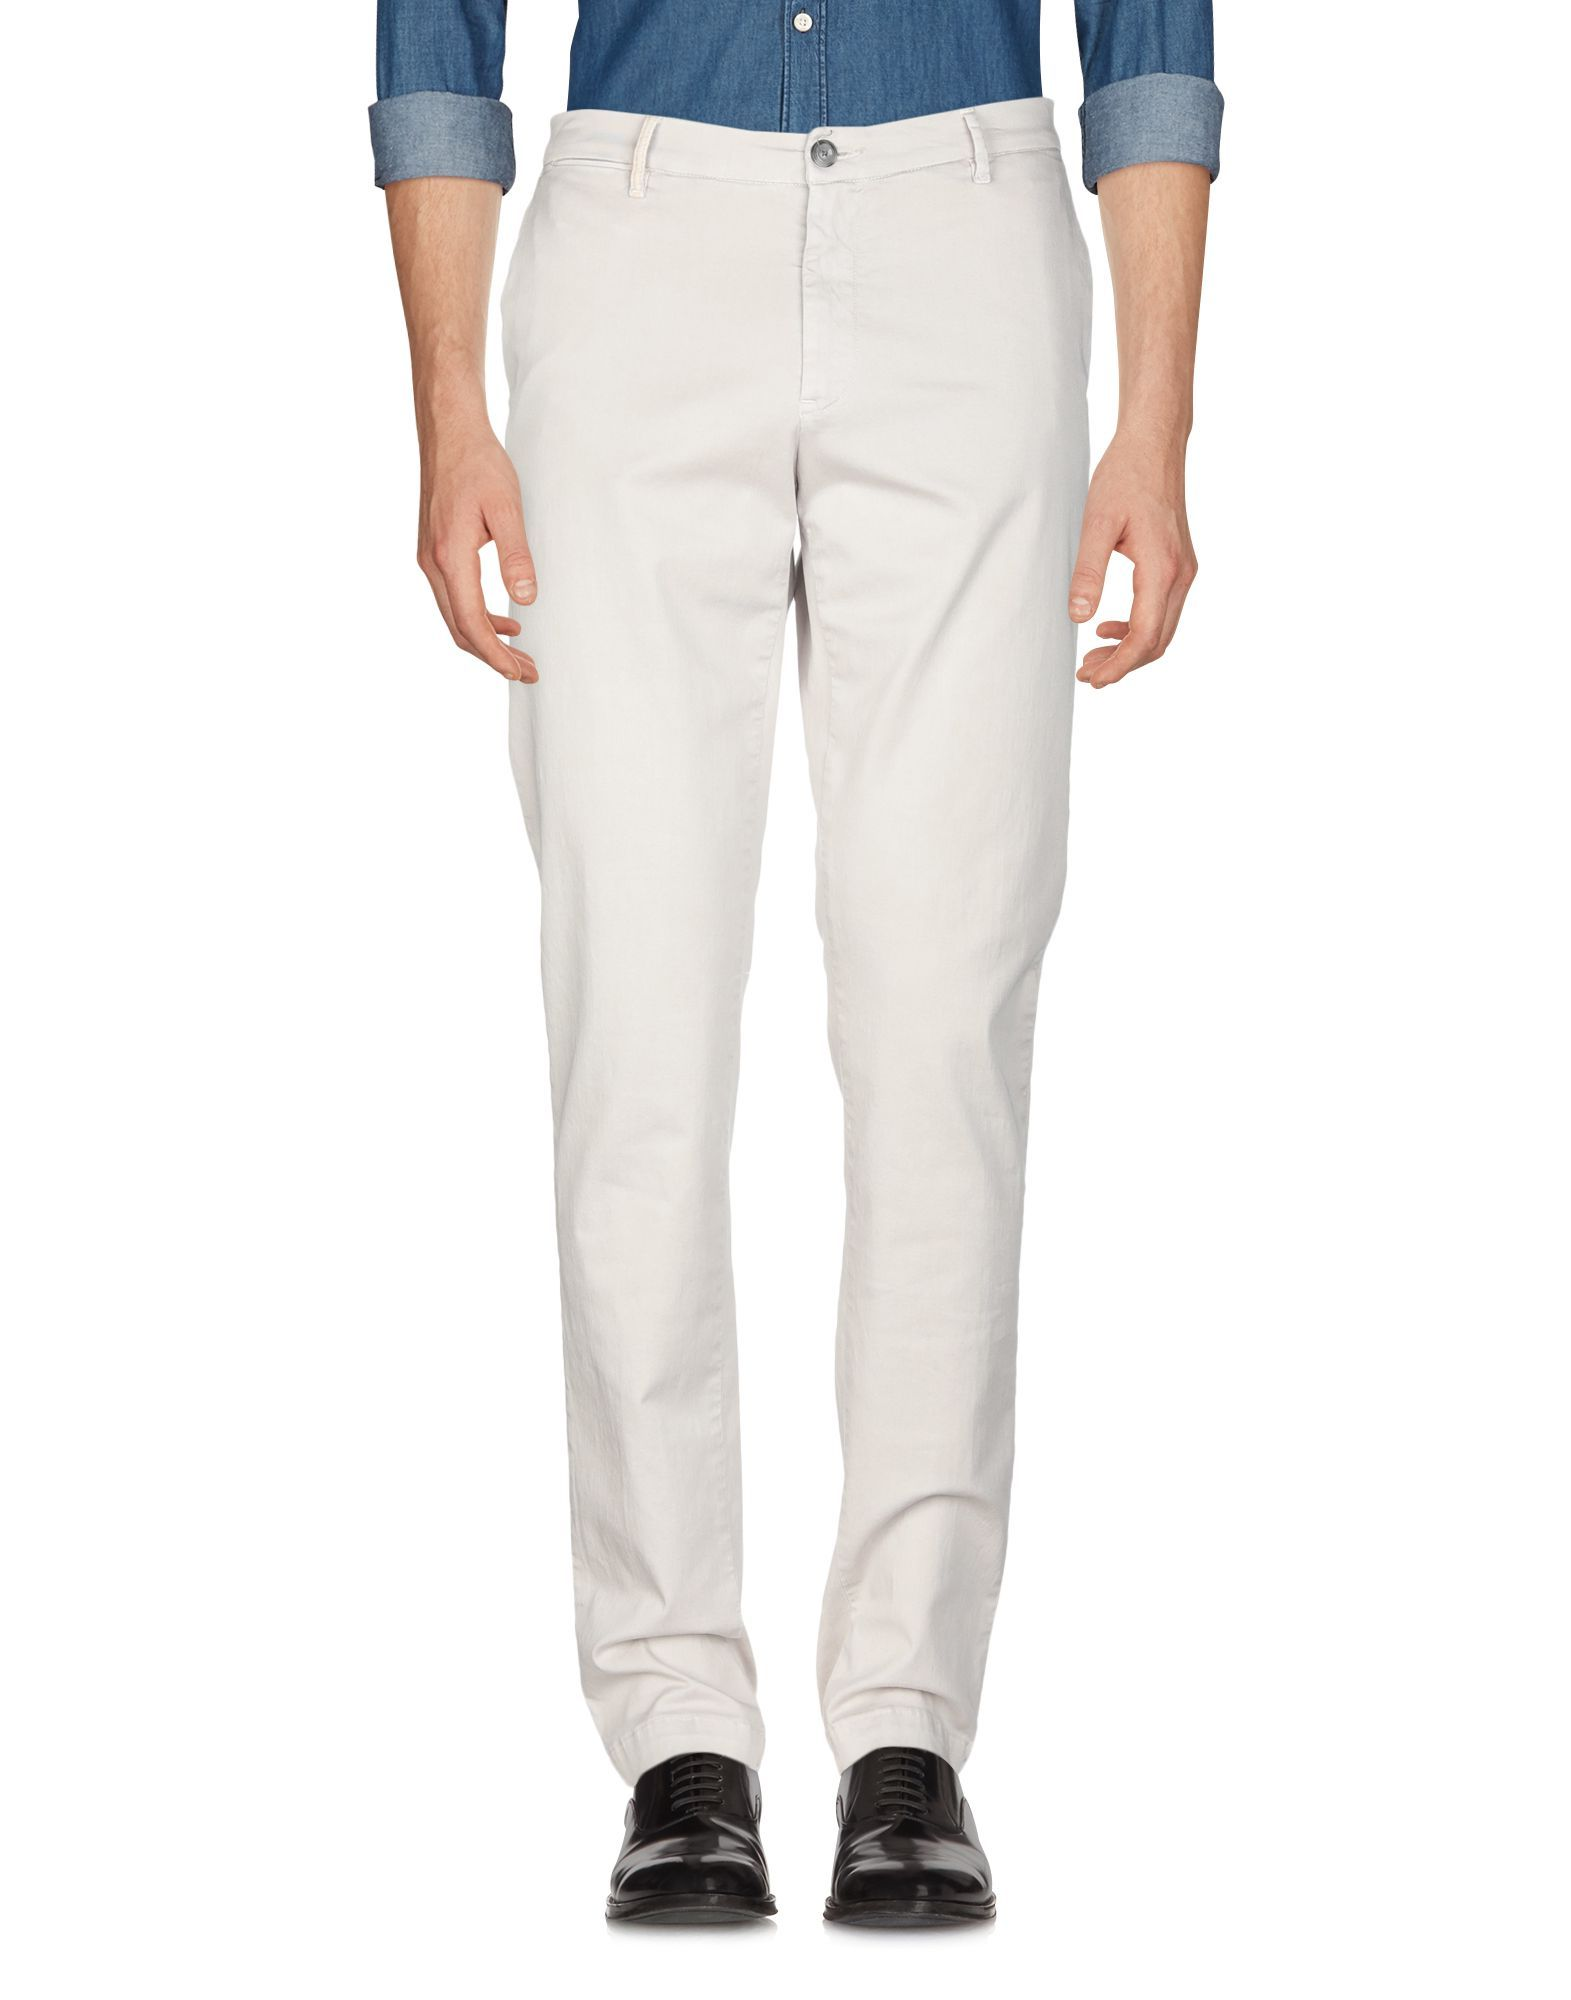 Trussardi Jeans Light Grey Cotton Trousers